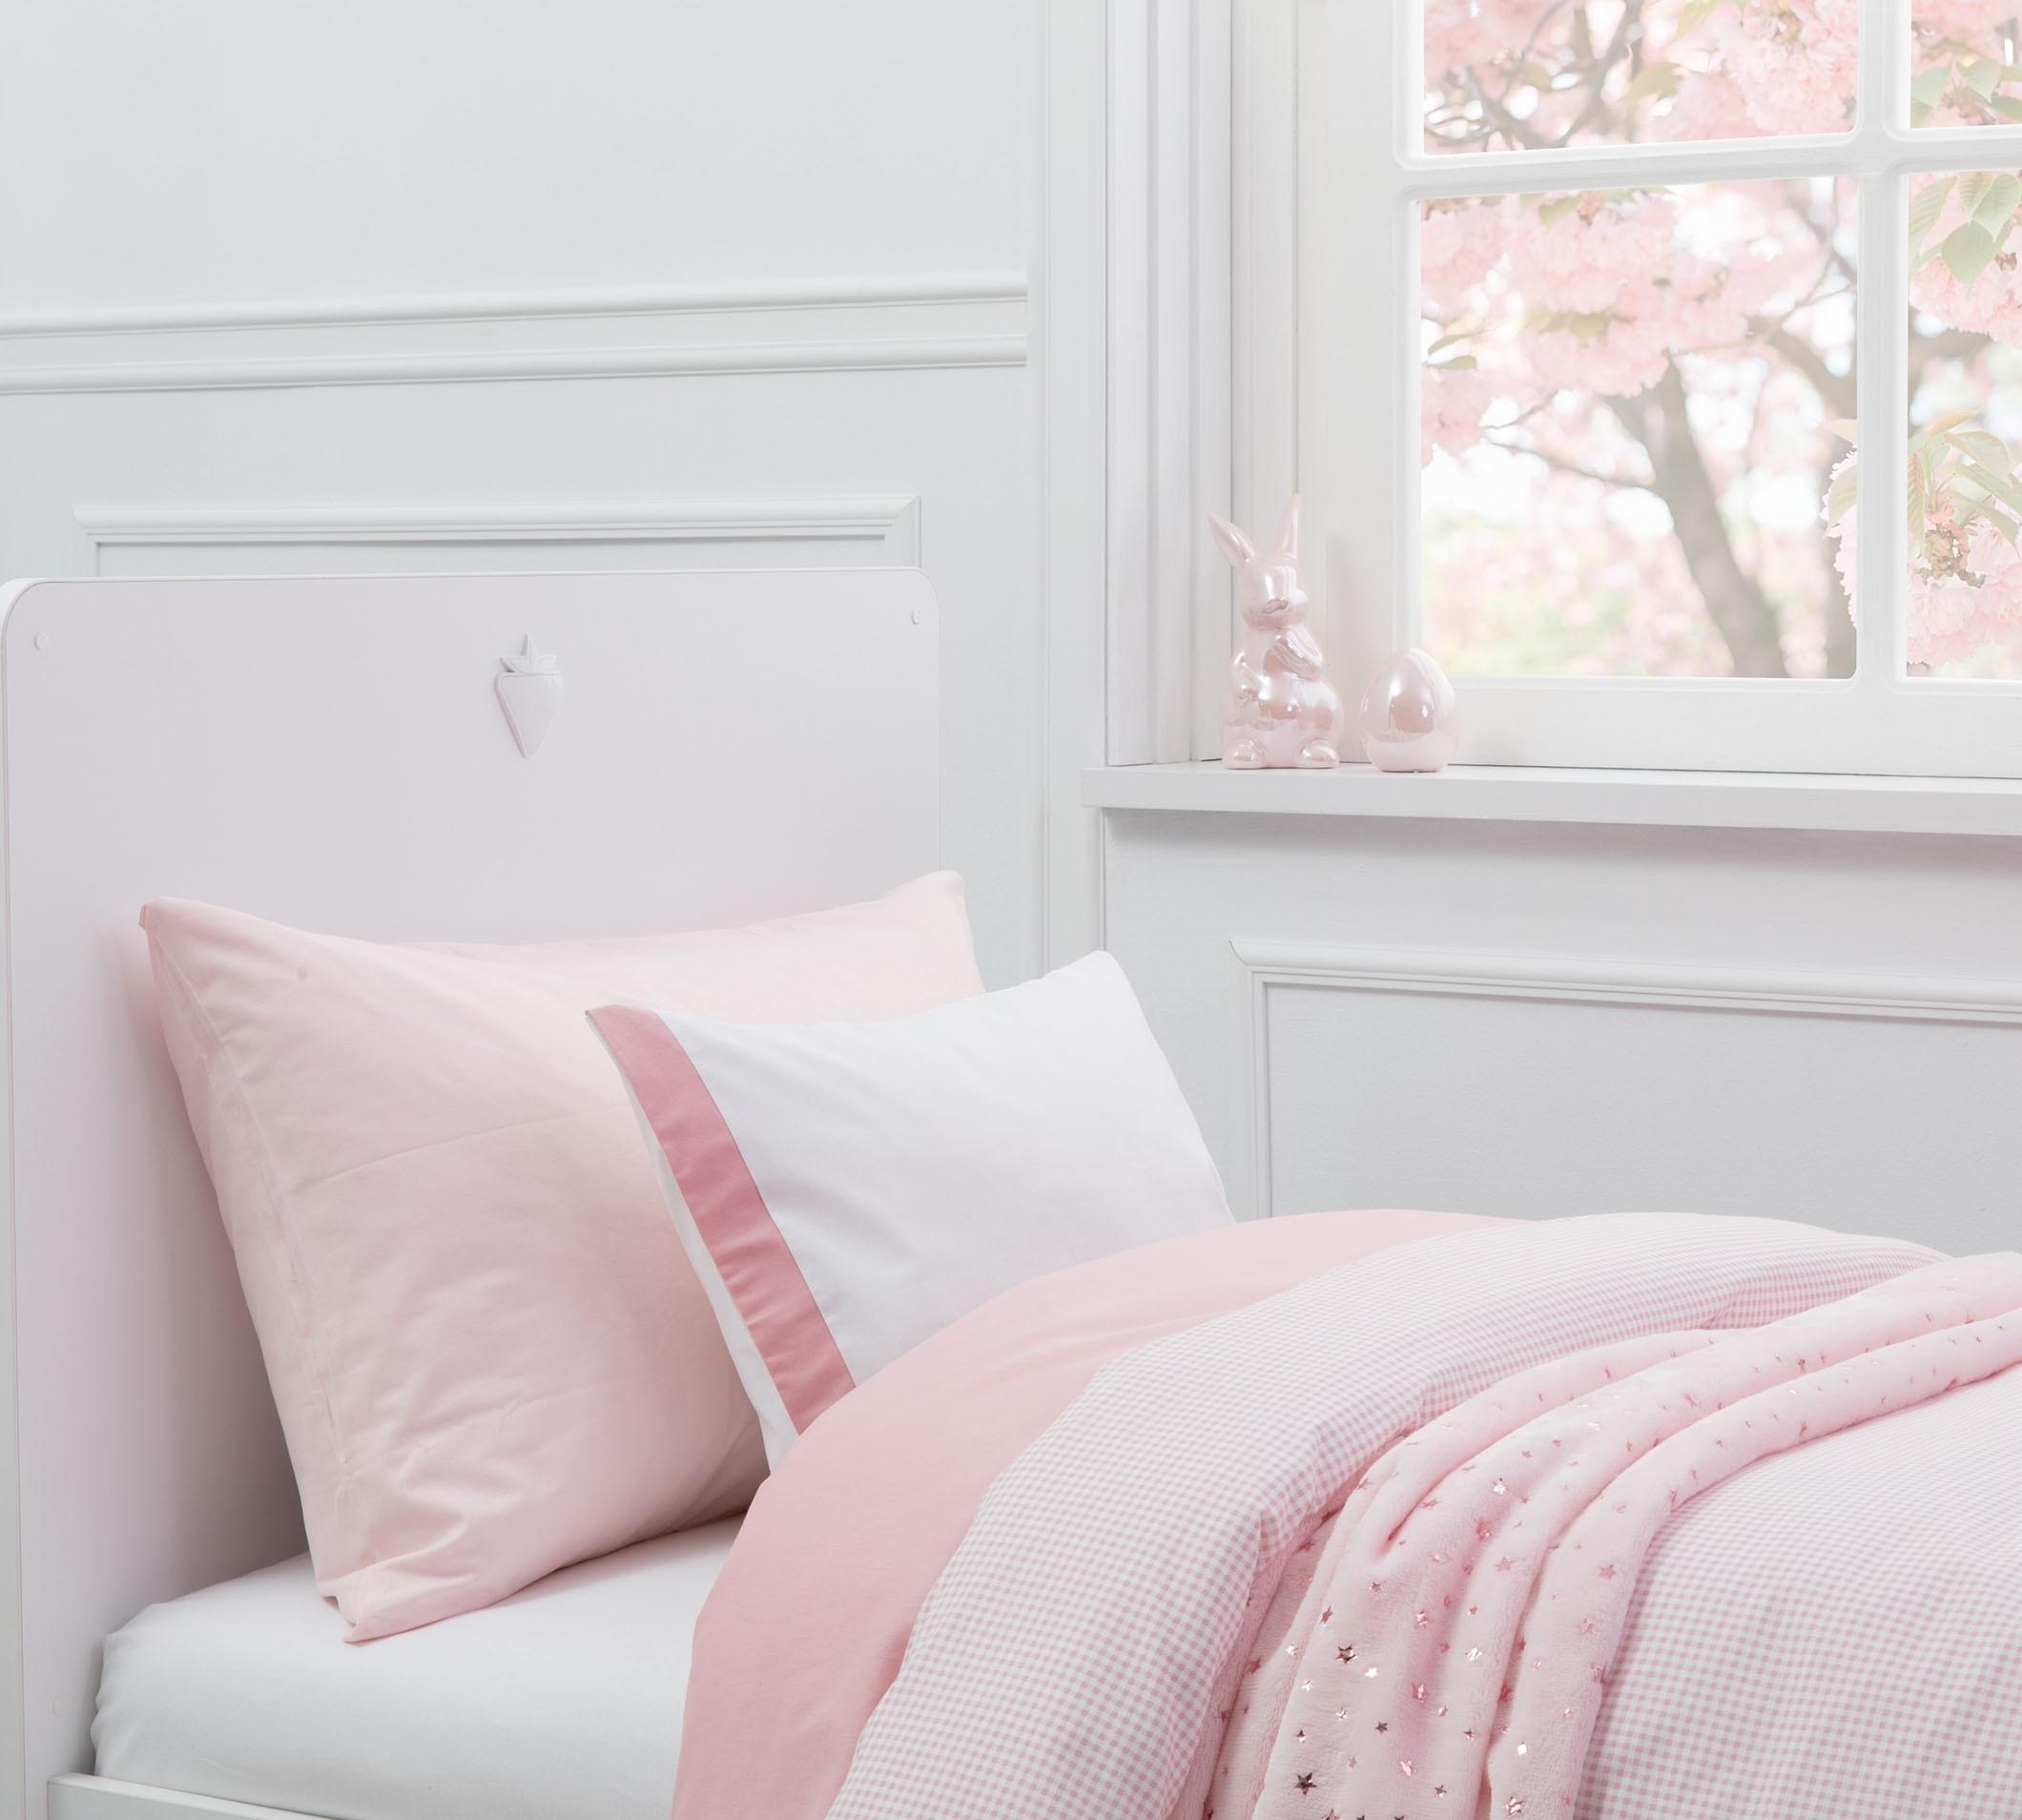 Lenjerie de pat copii bumbac Pure Roz imagine